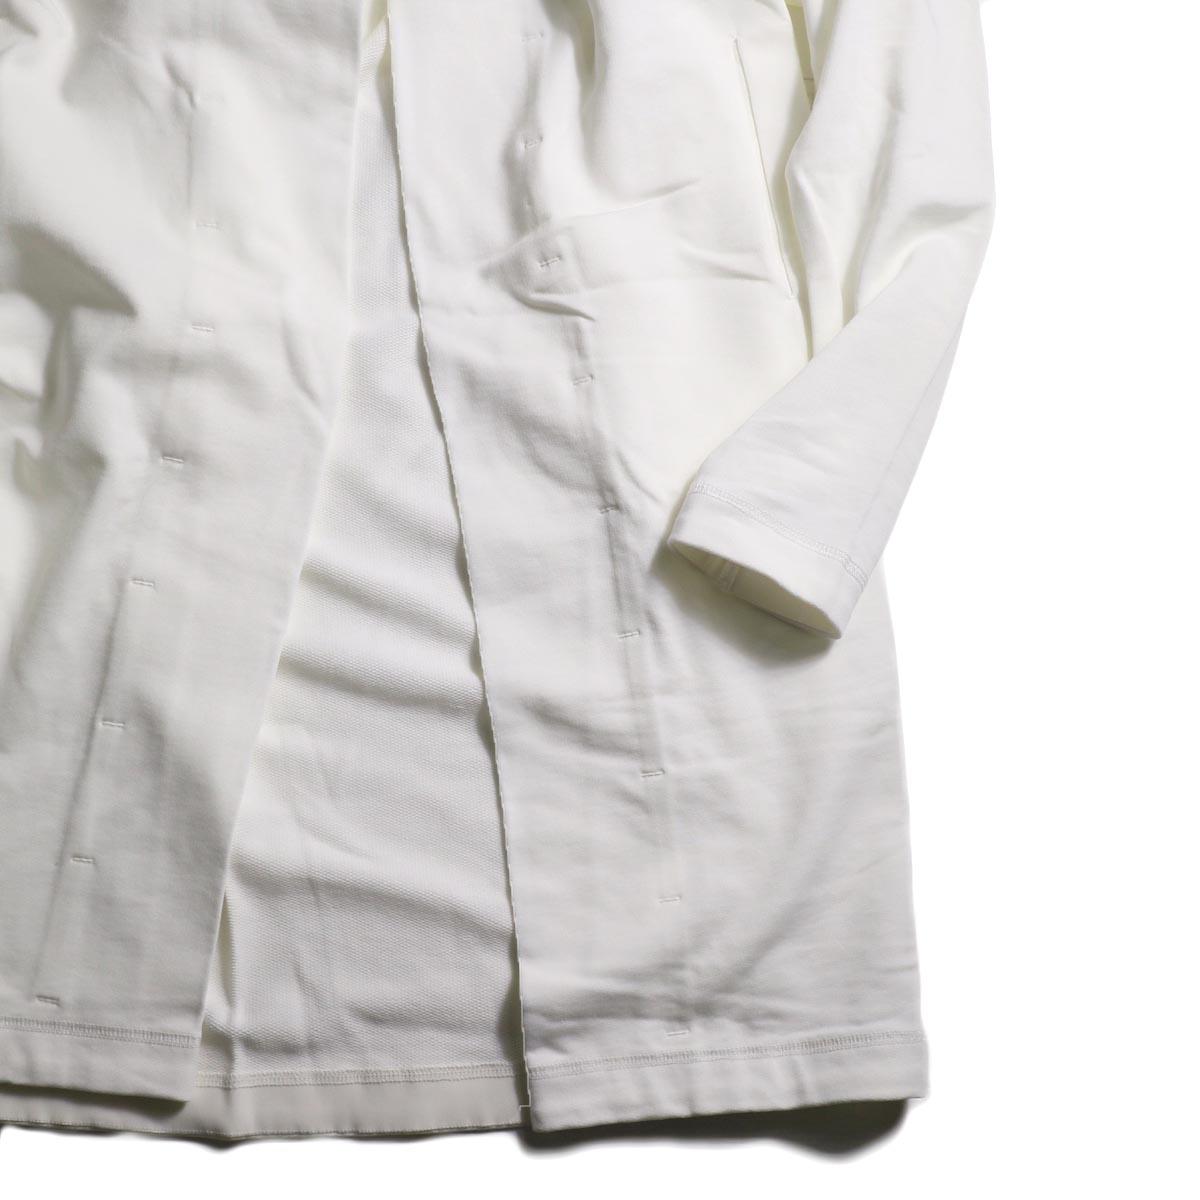 BLUEBIRD BOULEVARD / ジャージートッパーコート (White)袖、裾